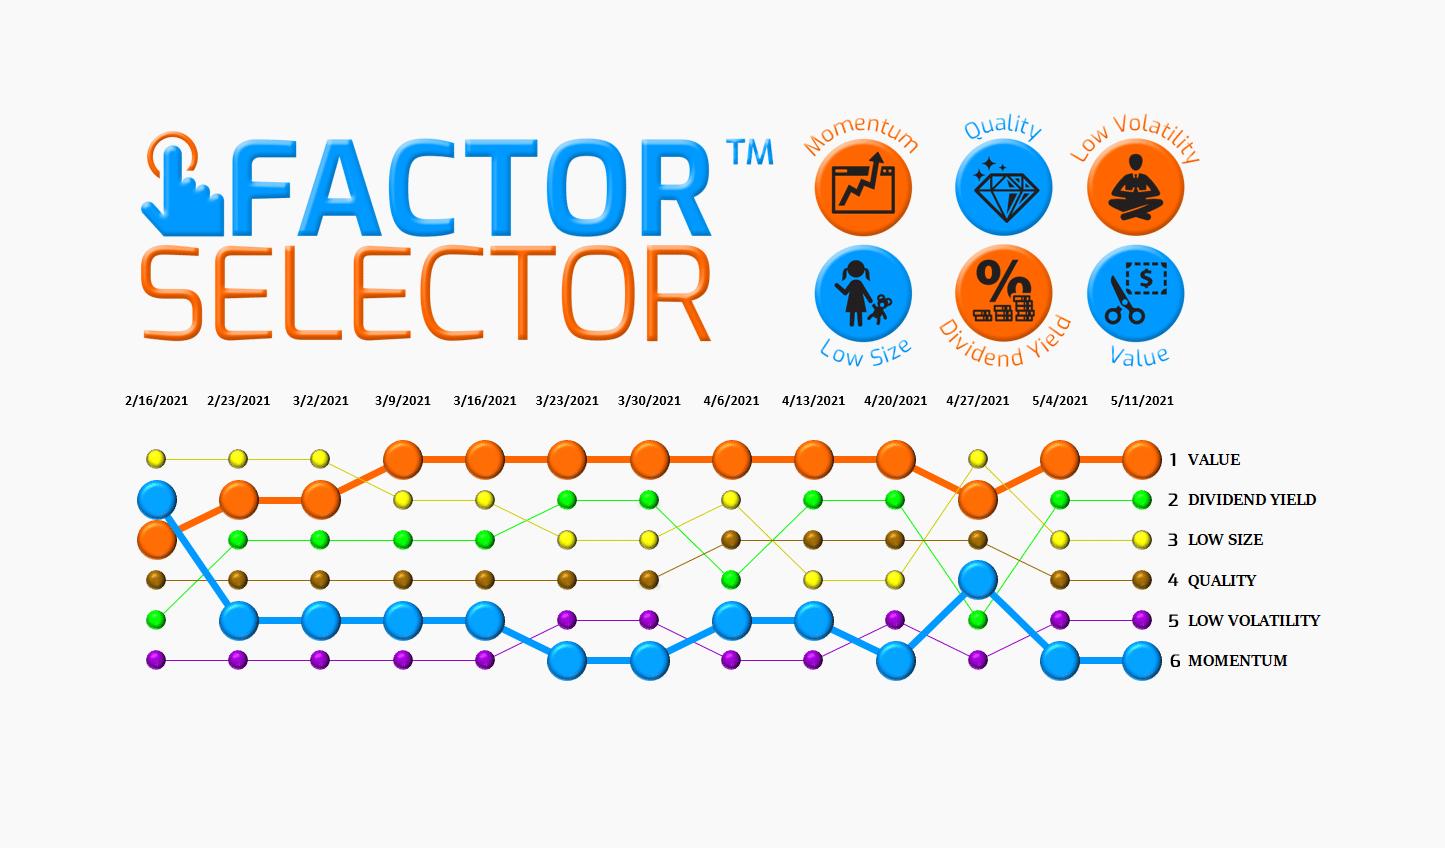 Factor Selector™  – 05/12/21 via @https://www.pinterest.com/market_scholars